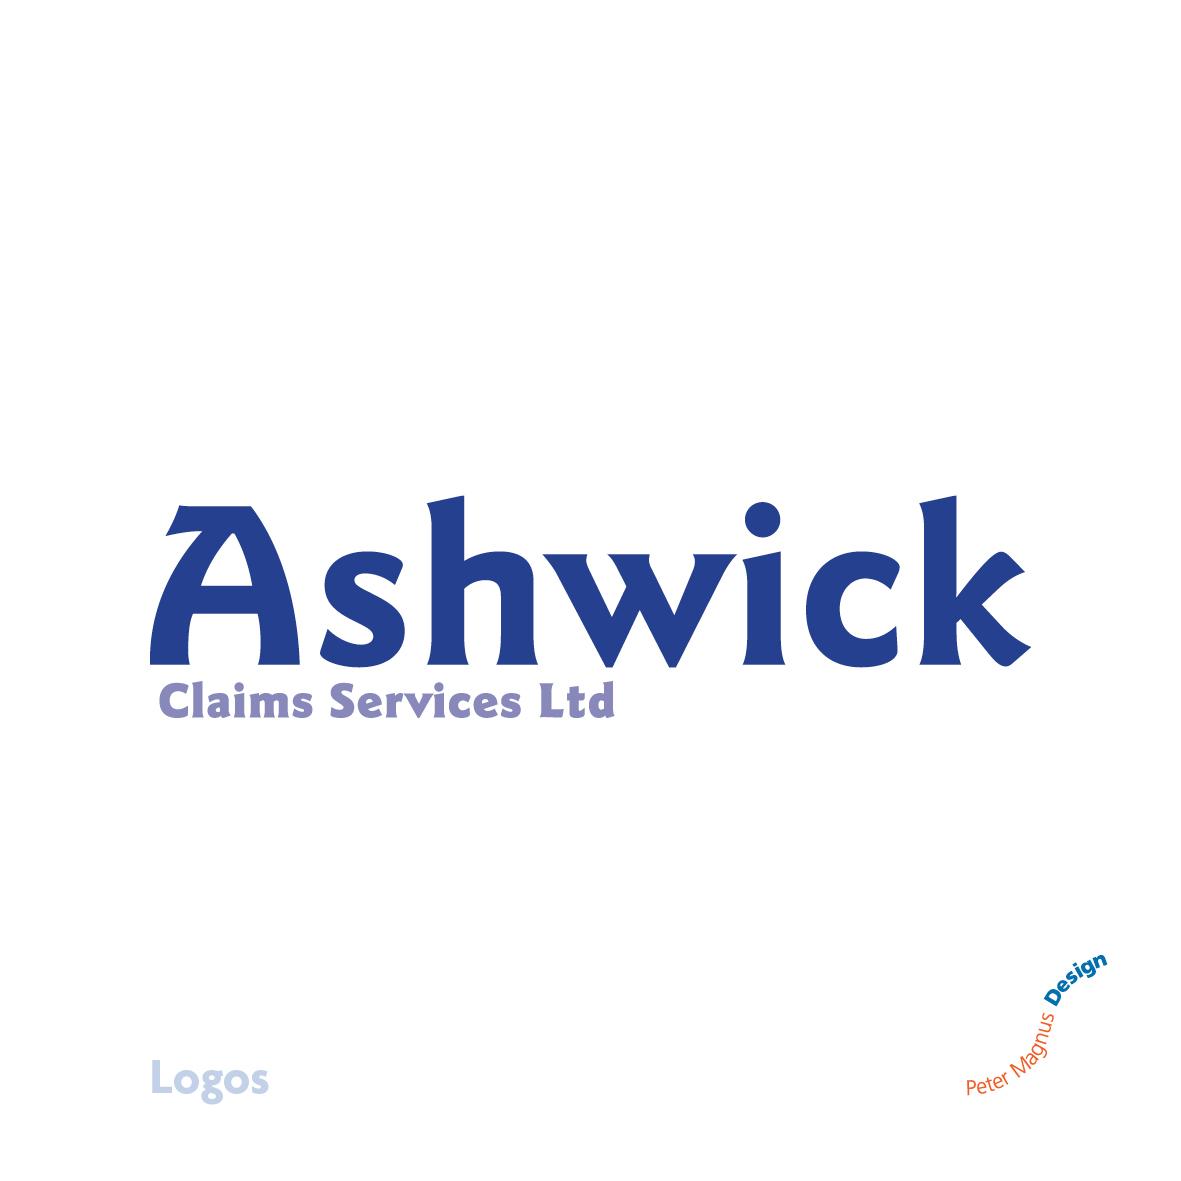 Ashwick Claims Services logo, Herts